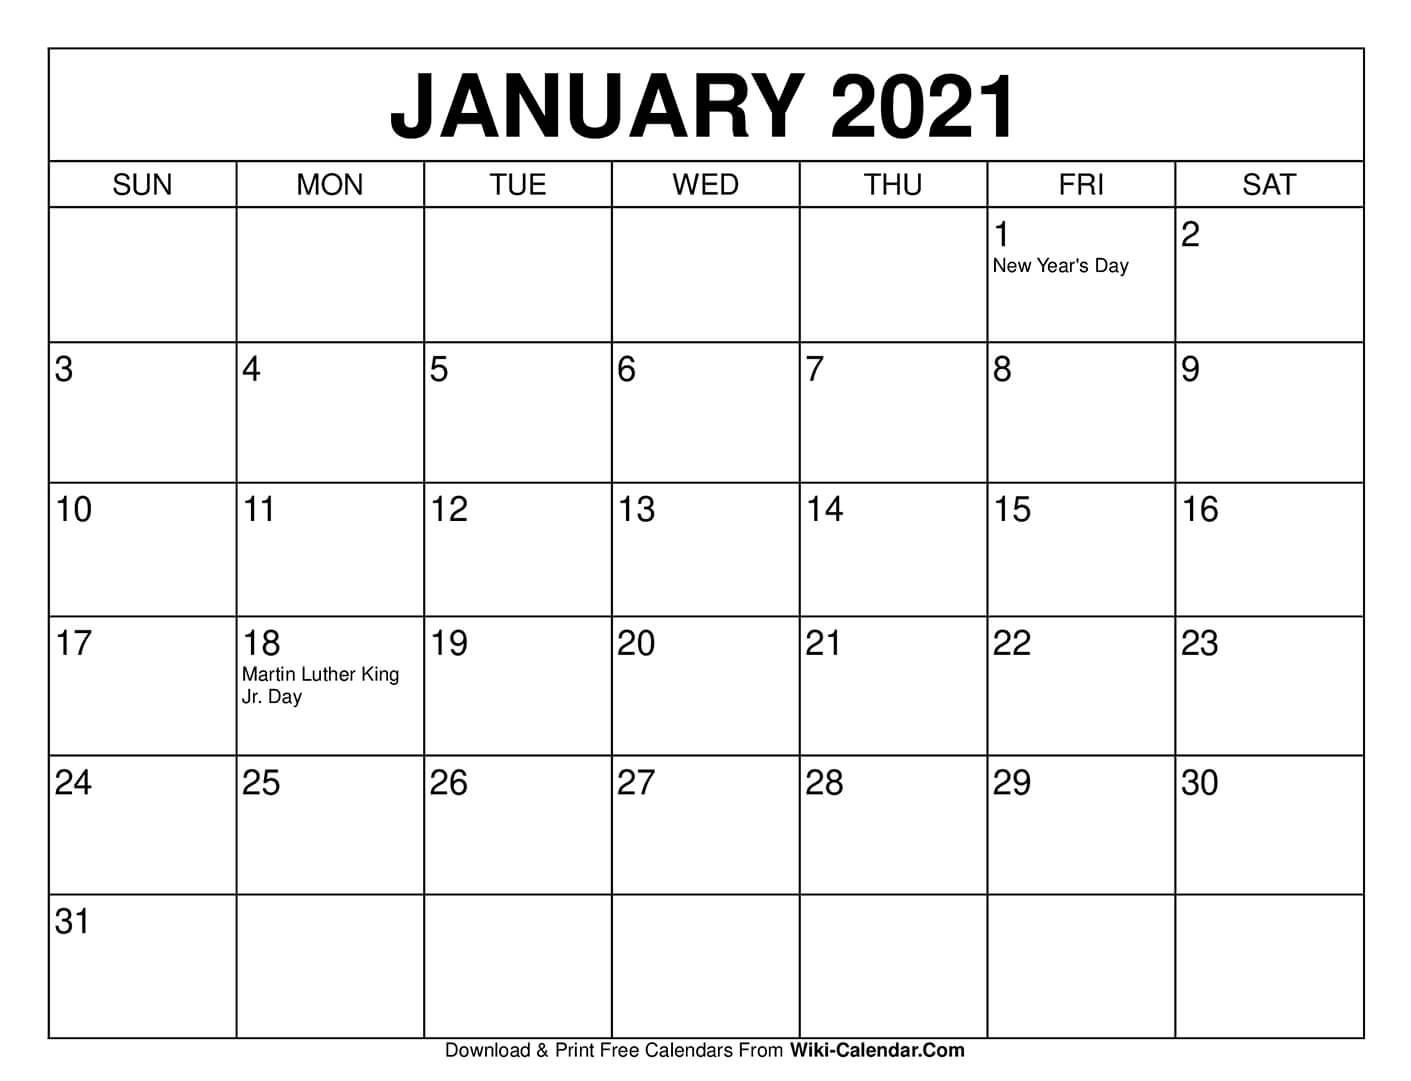 Free Printable January 2021 Calendars Calendar Template To Print Free